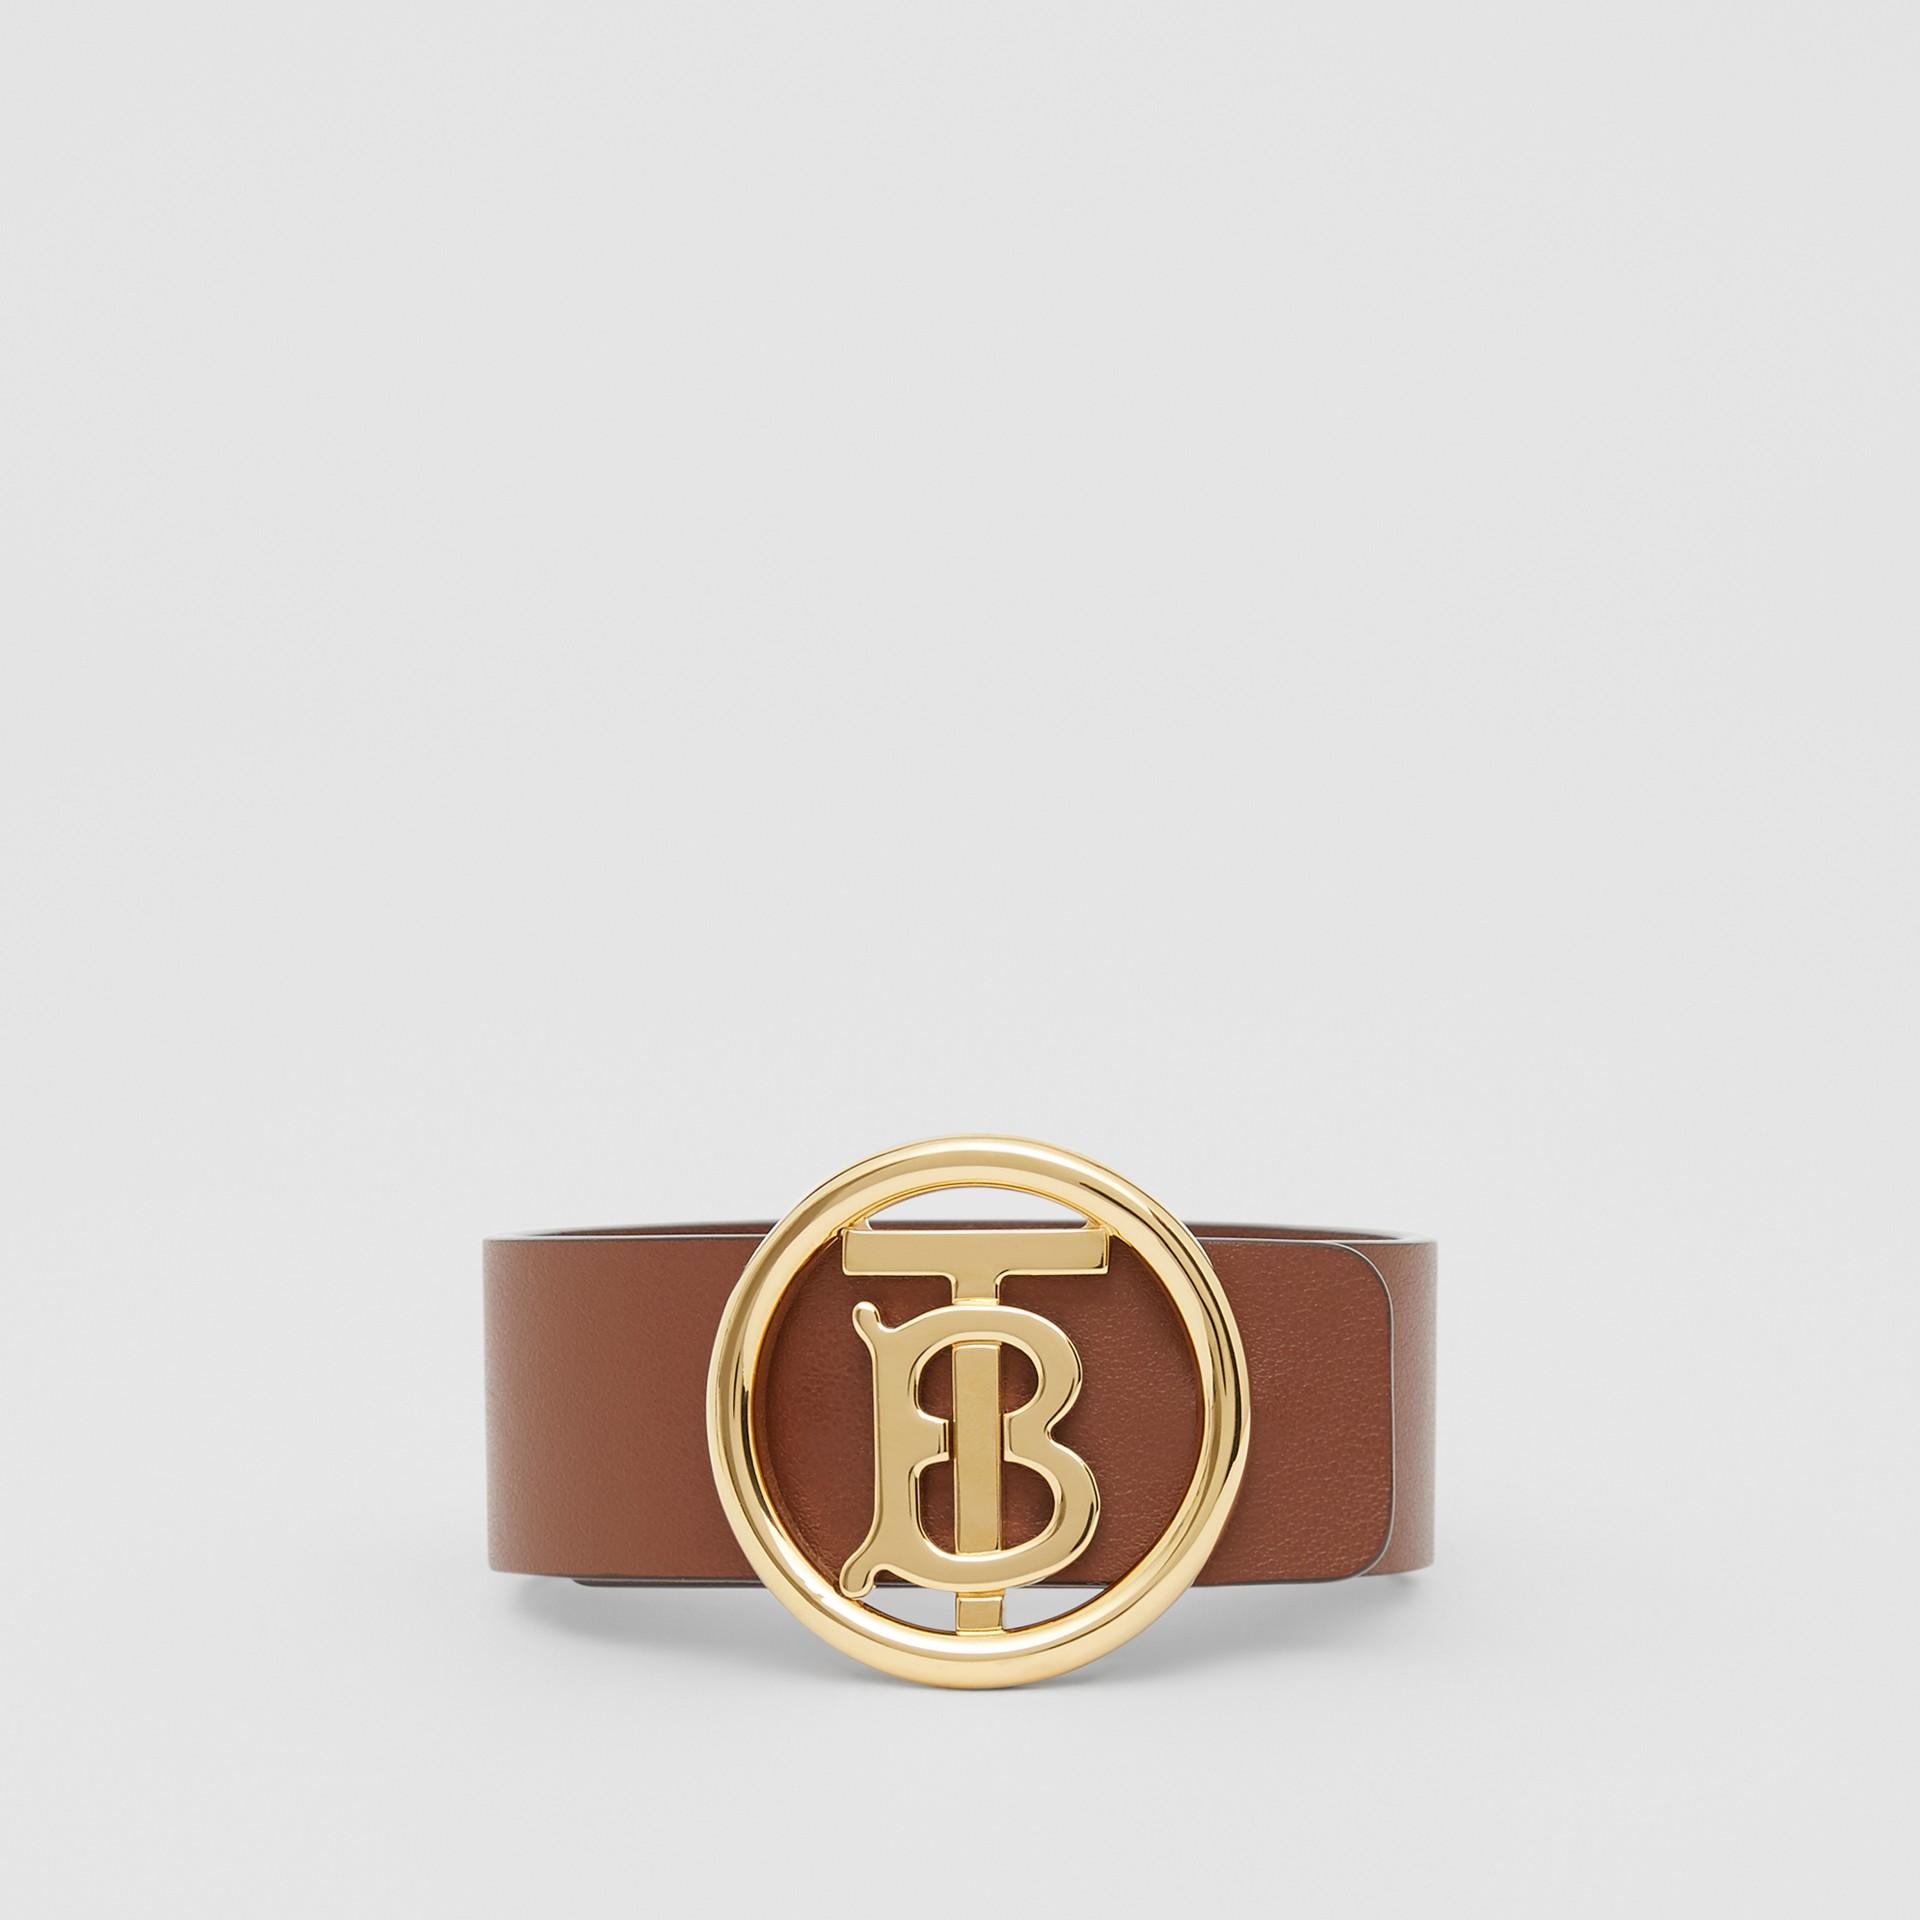 Monogram Motif Leather Bracelet in Tan - Women | Burberry - gallery image 0